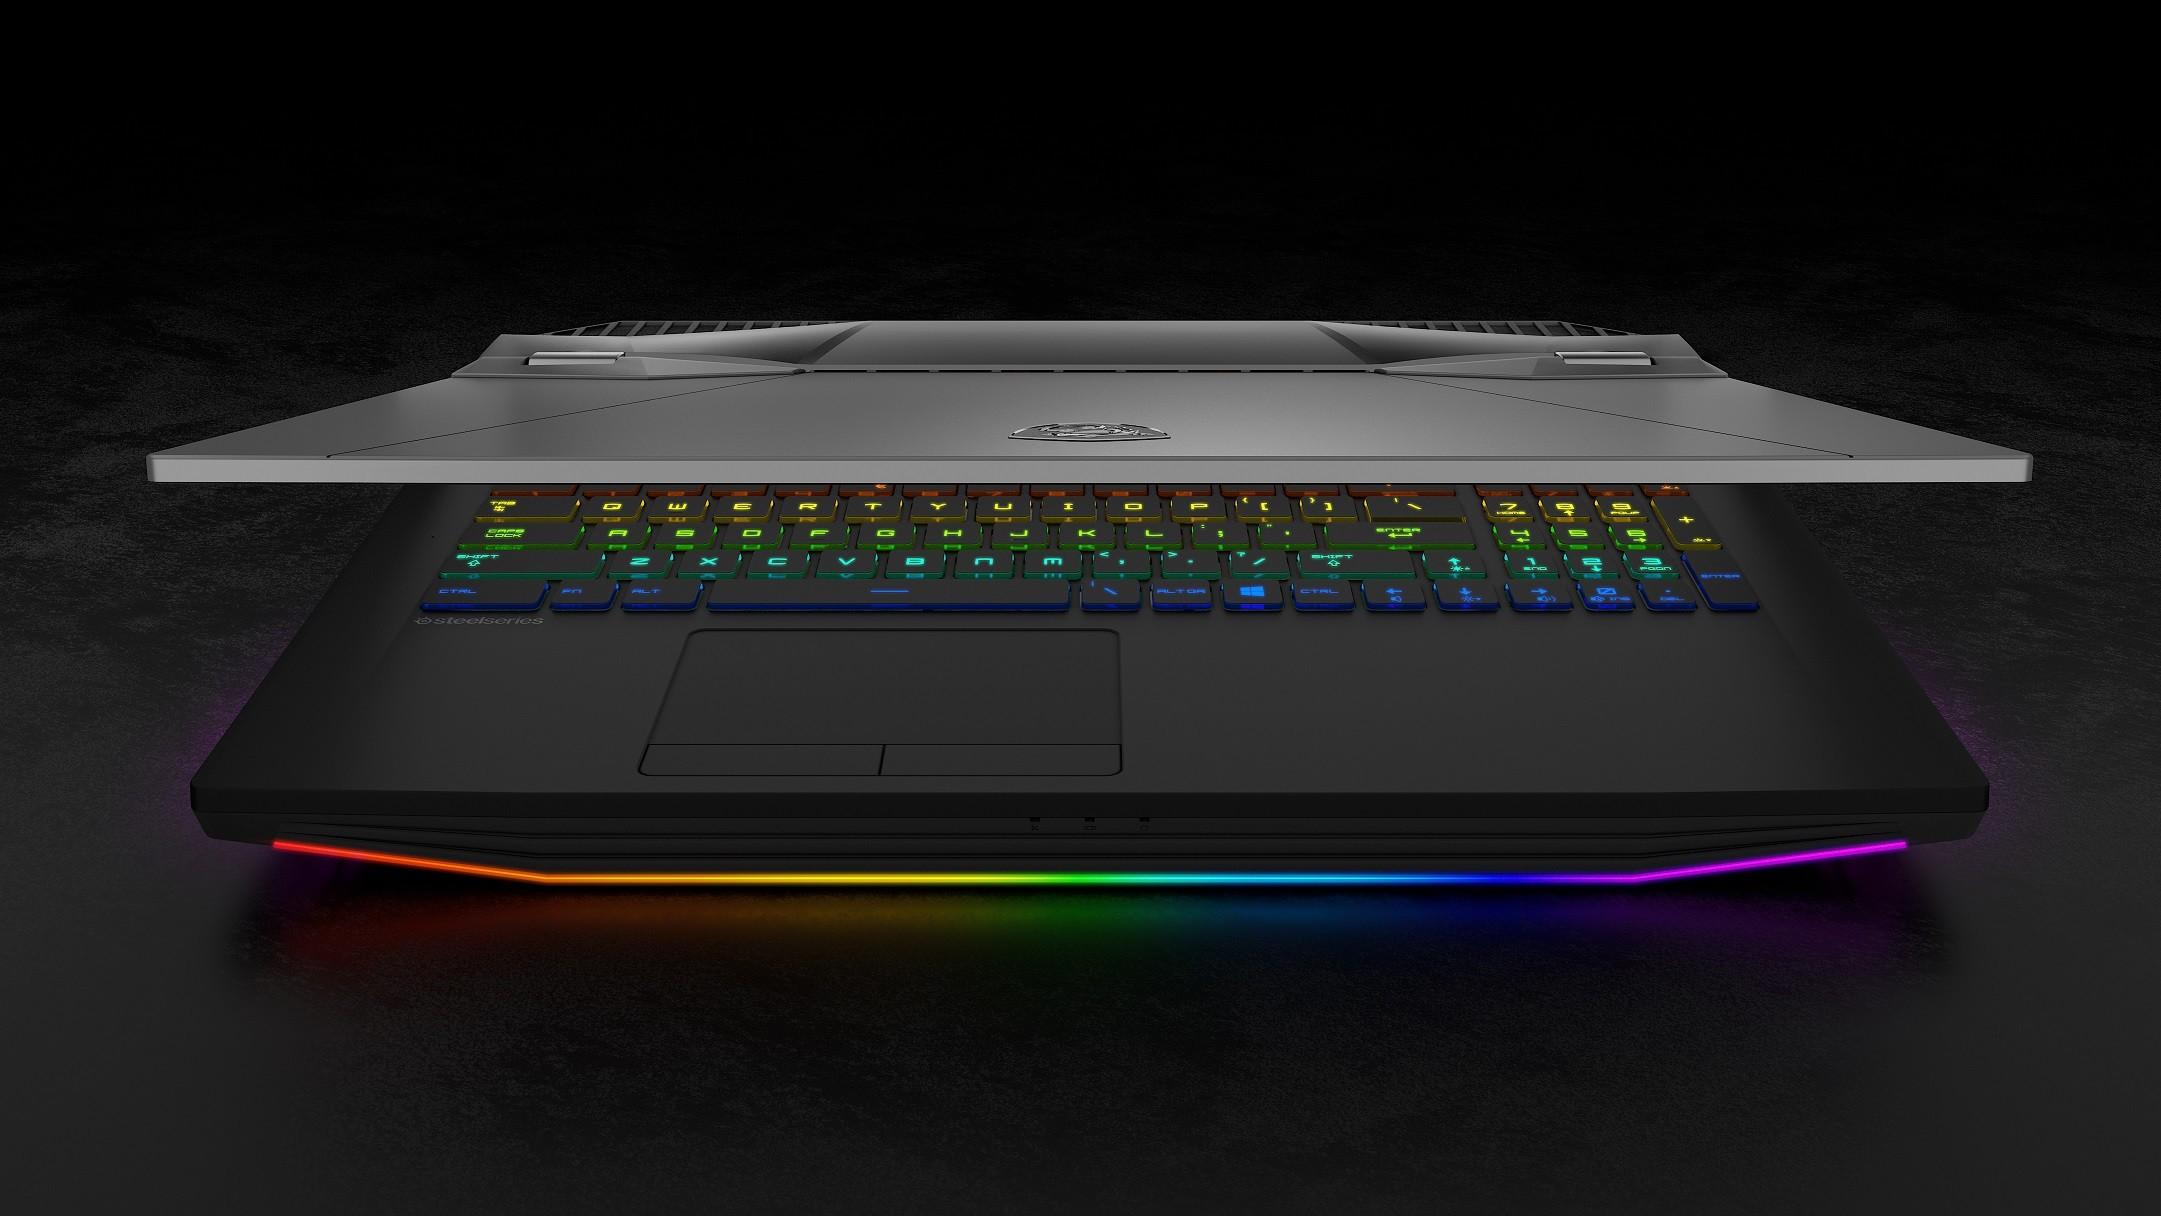 MSI's new GT76 Titan laptop has a 5GHz desktop Core i9 processor